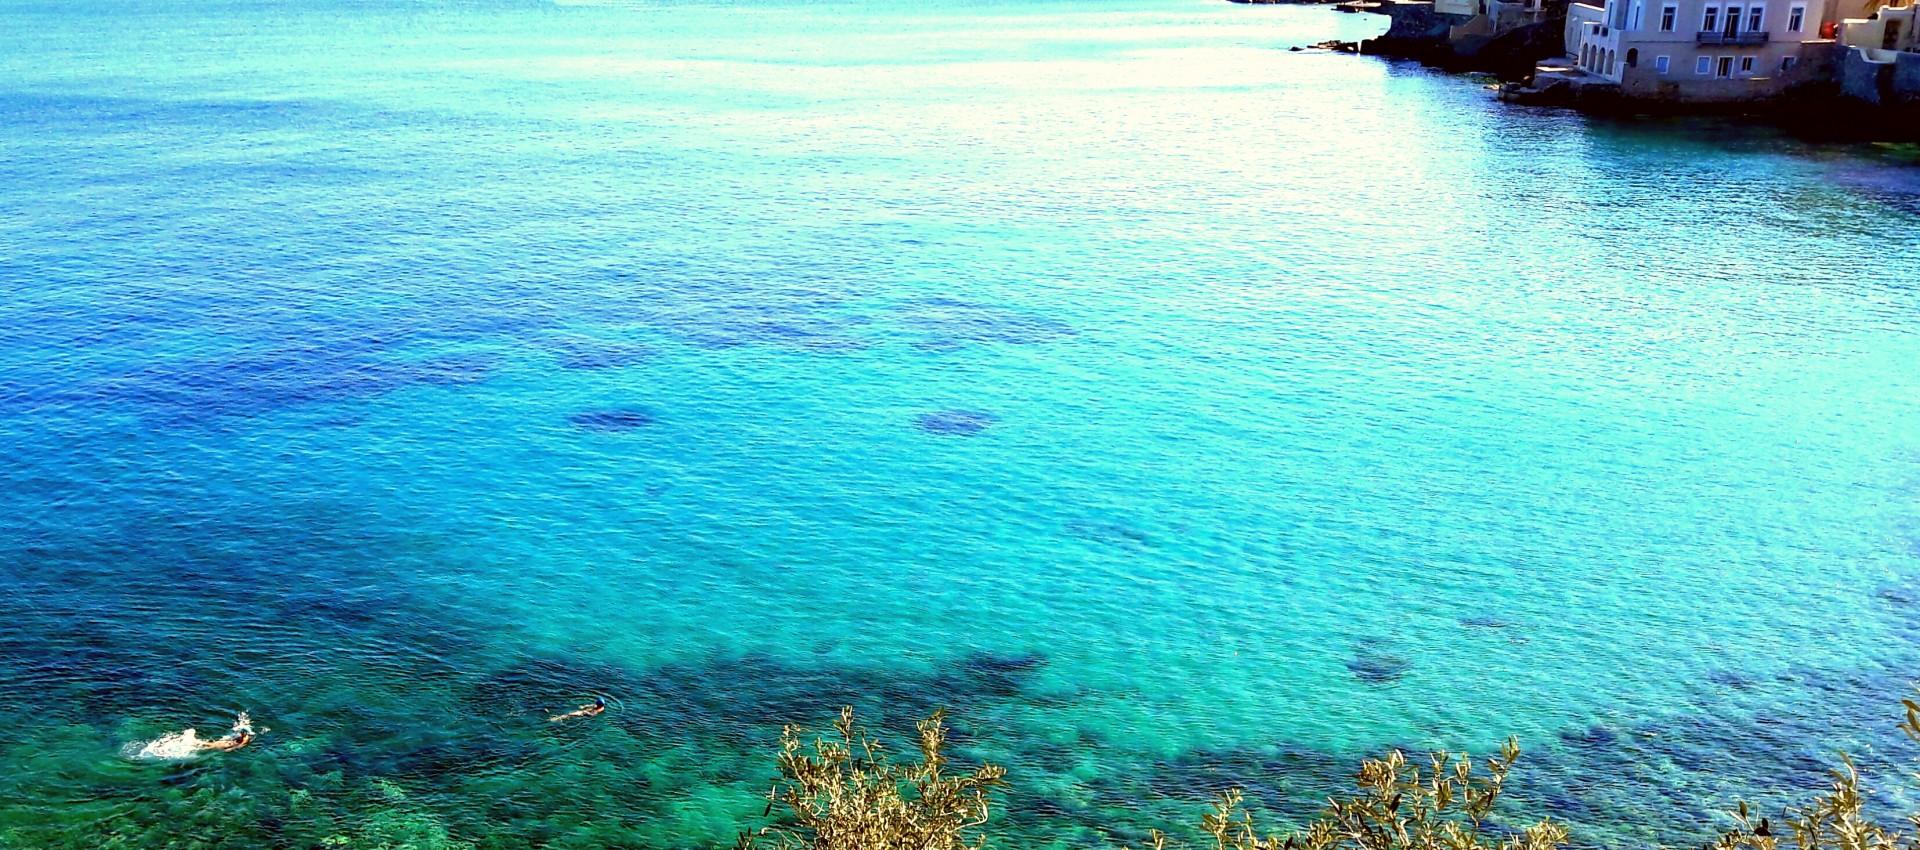 13th Annual International Festival of the Aegean